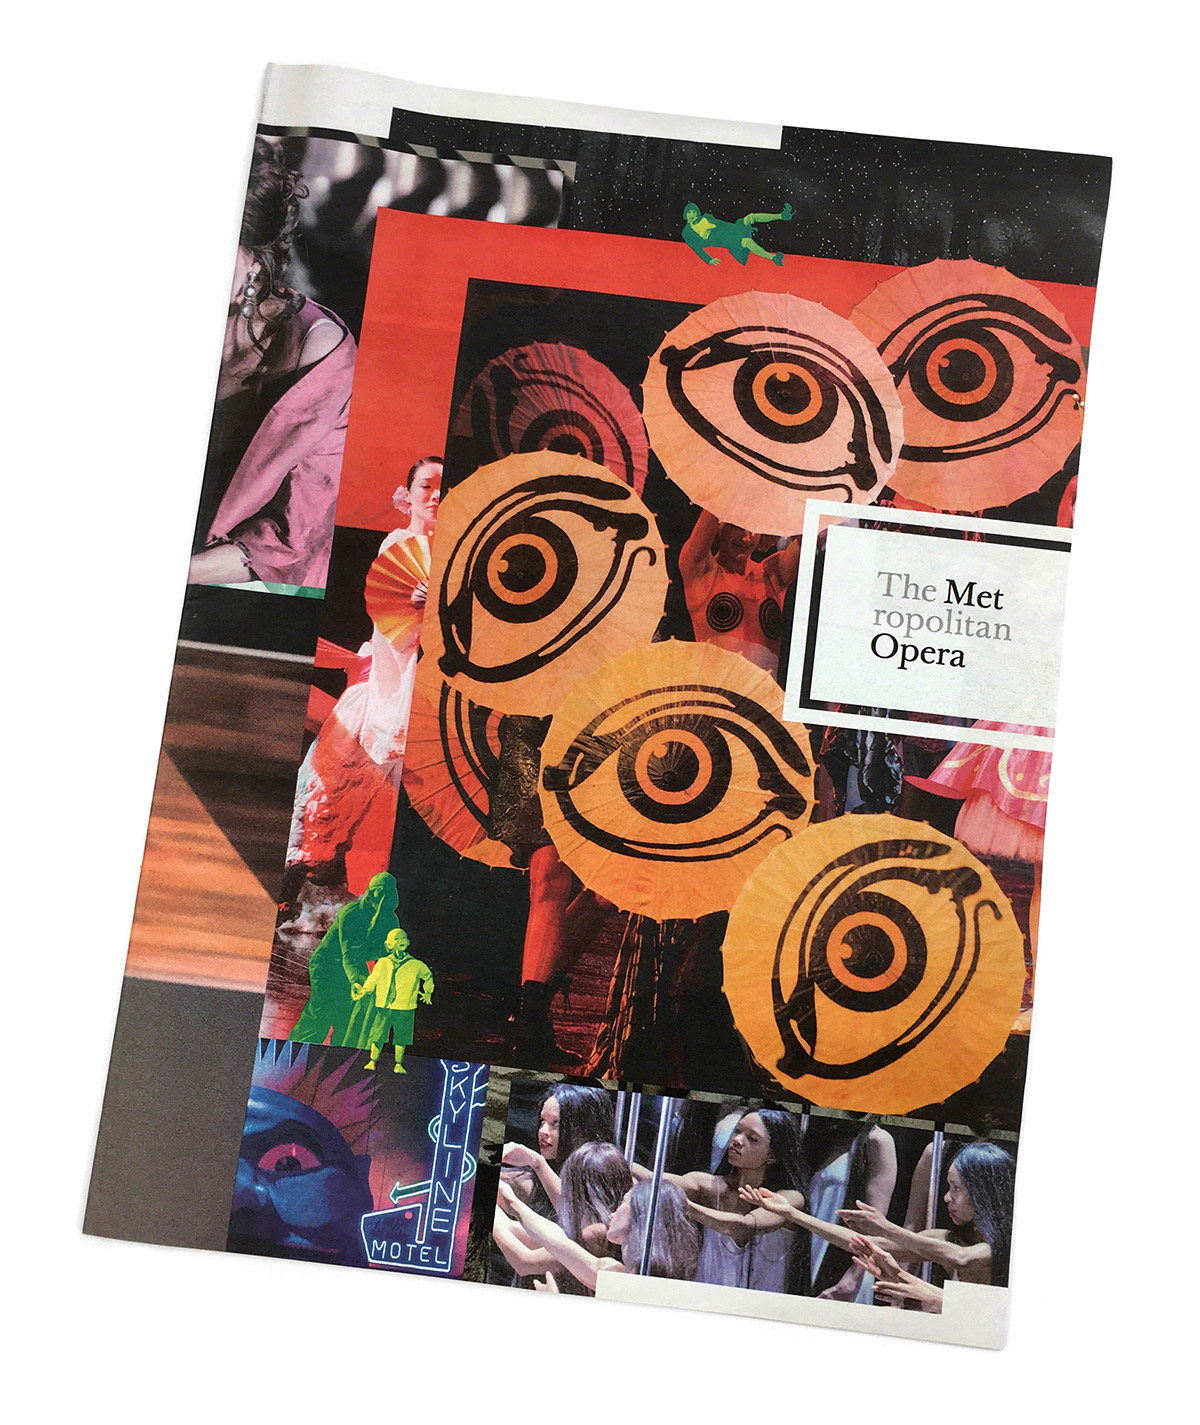 Metropolitan Opera print recruitment cover